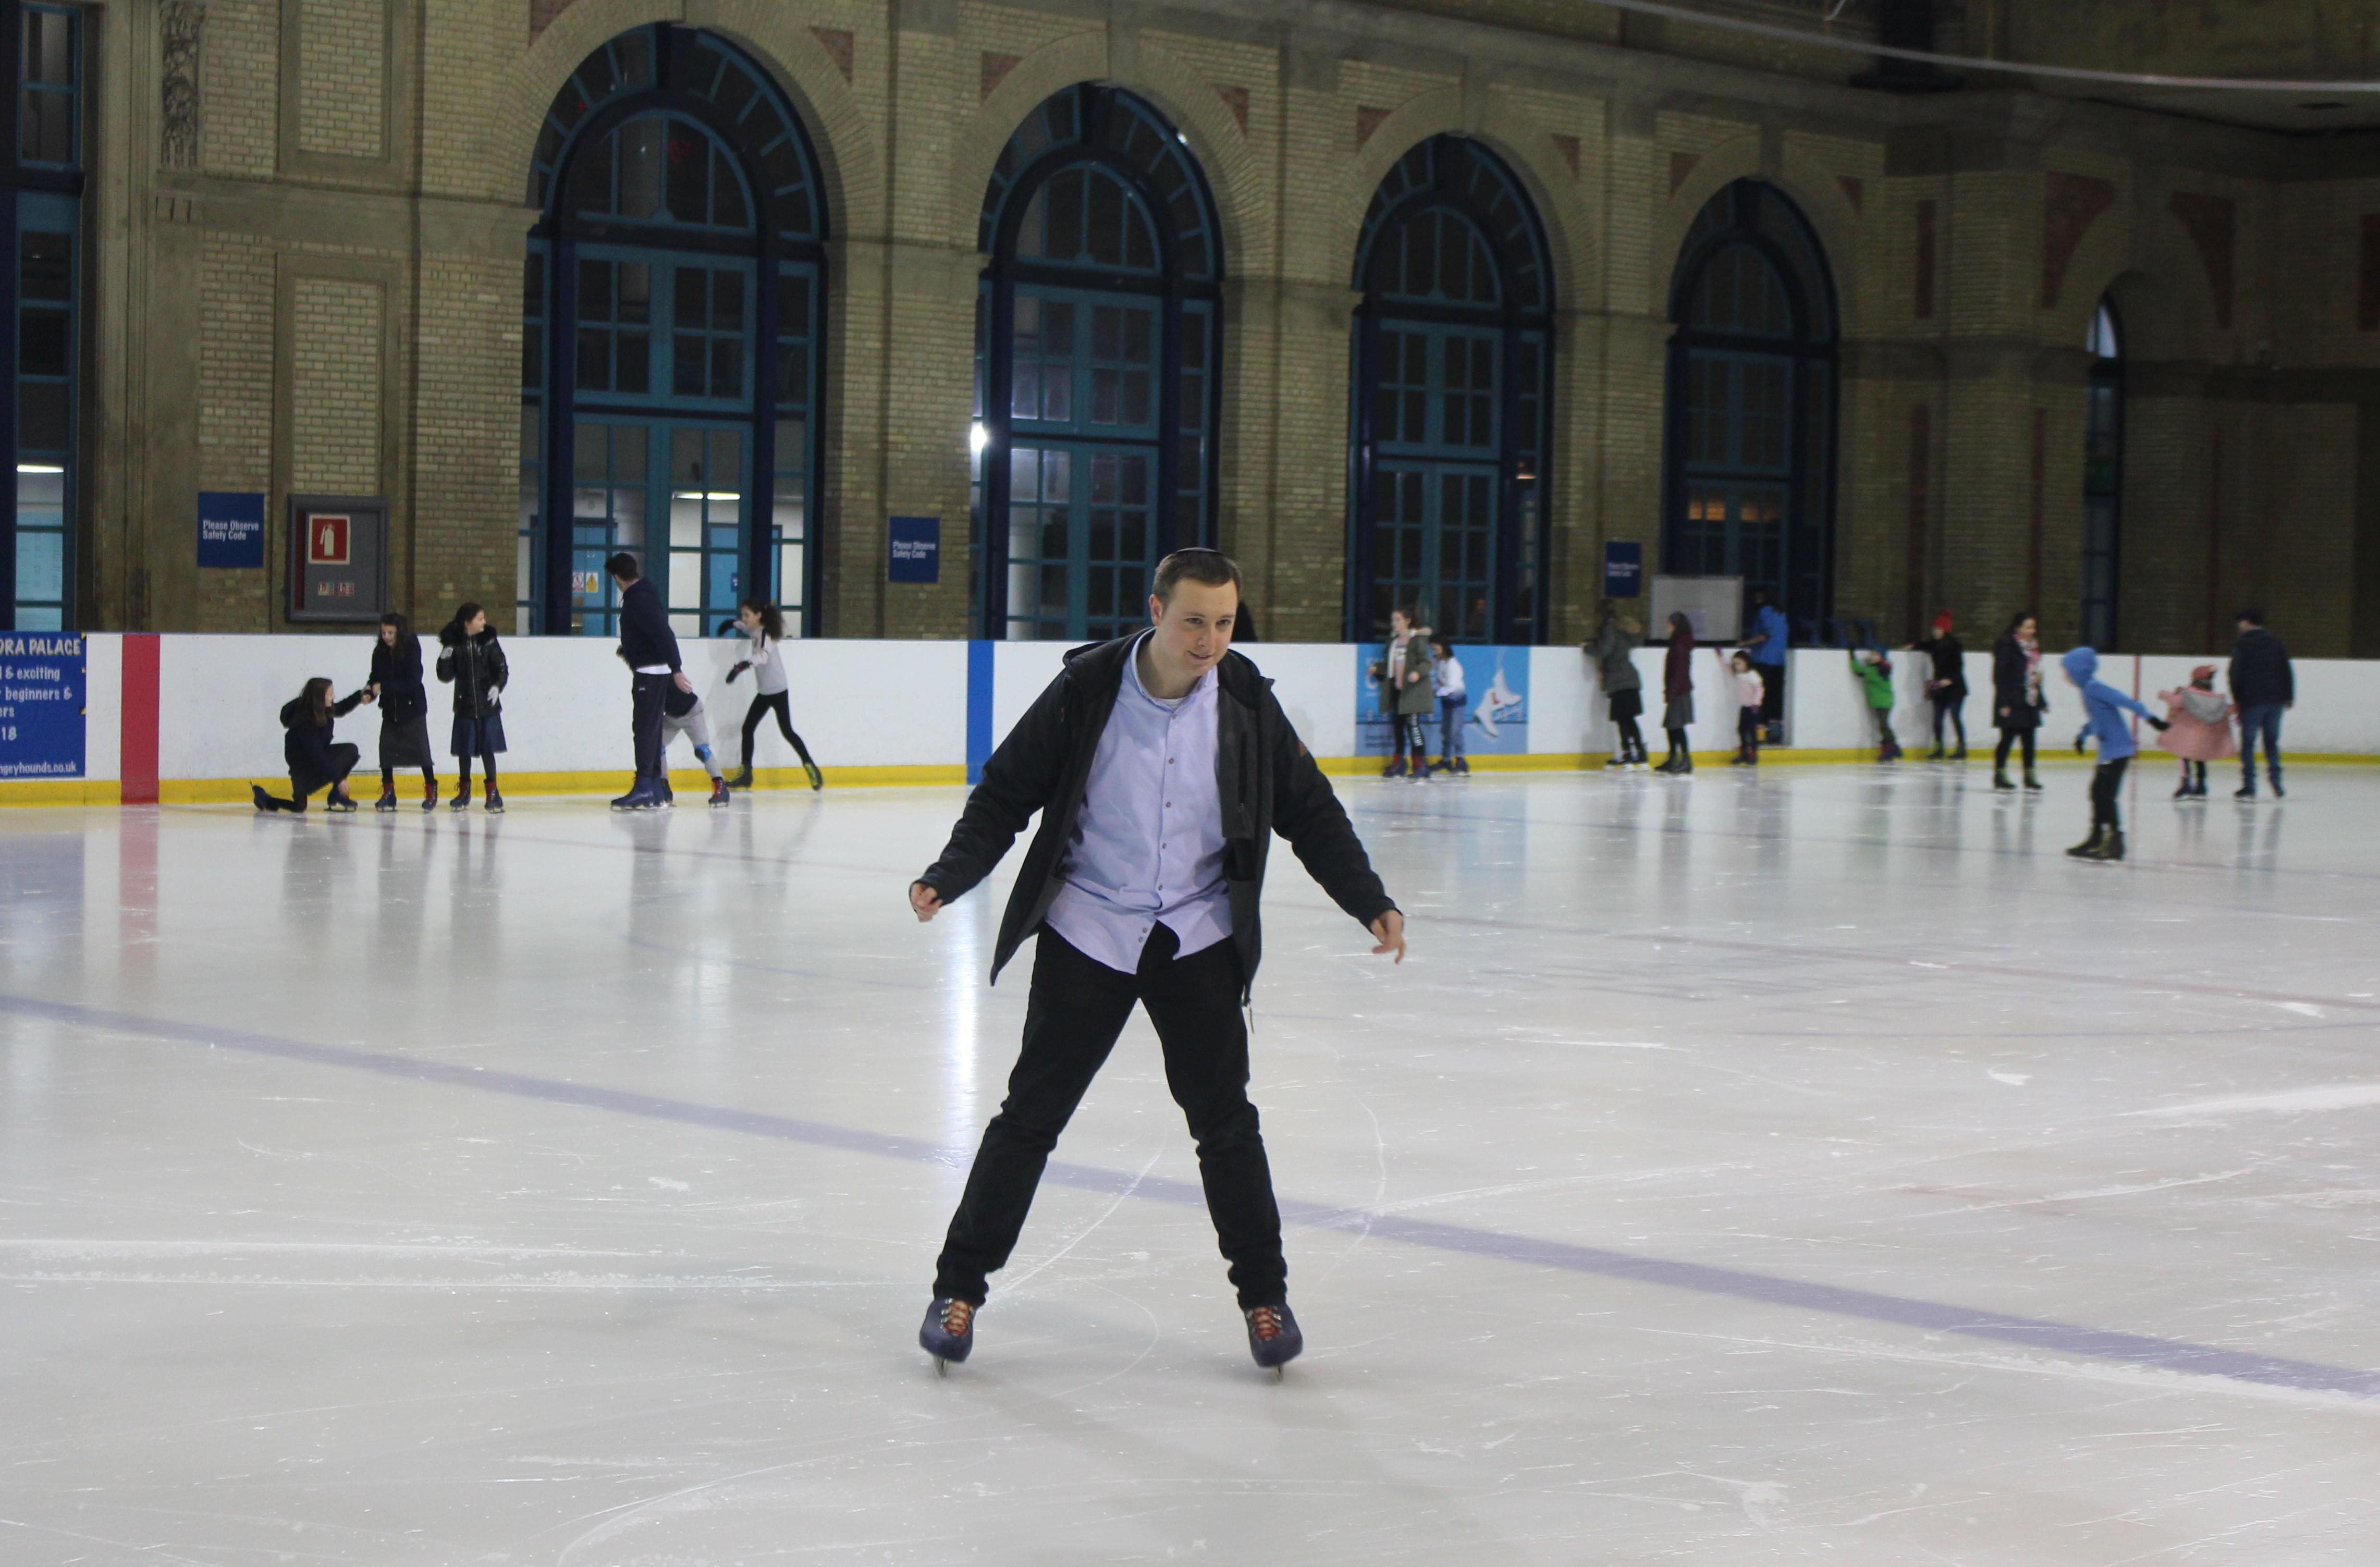 03 Alexandra Palace Ice Rink Community o